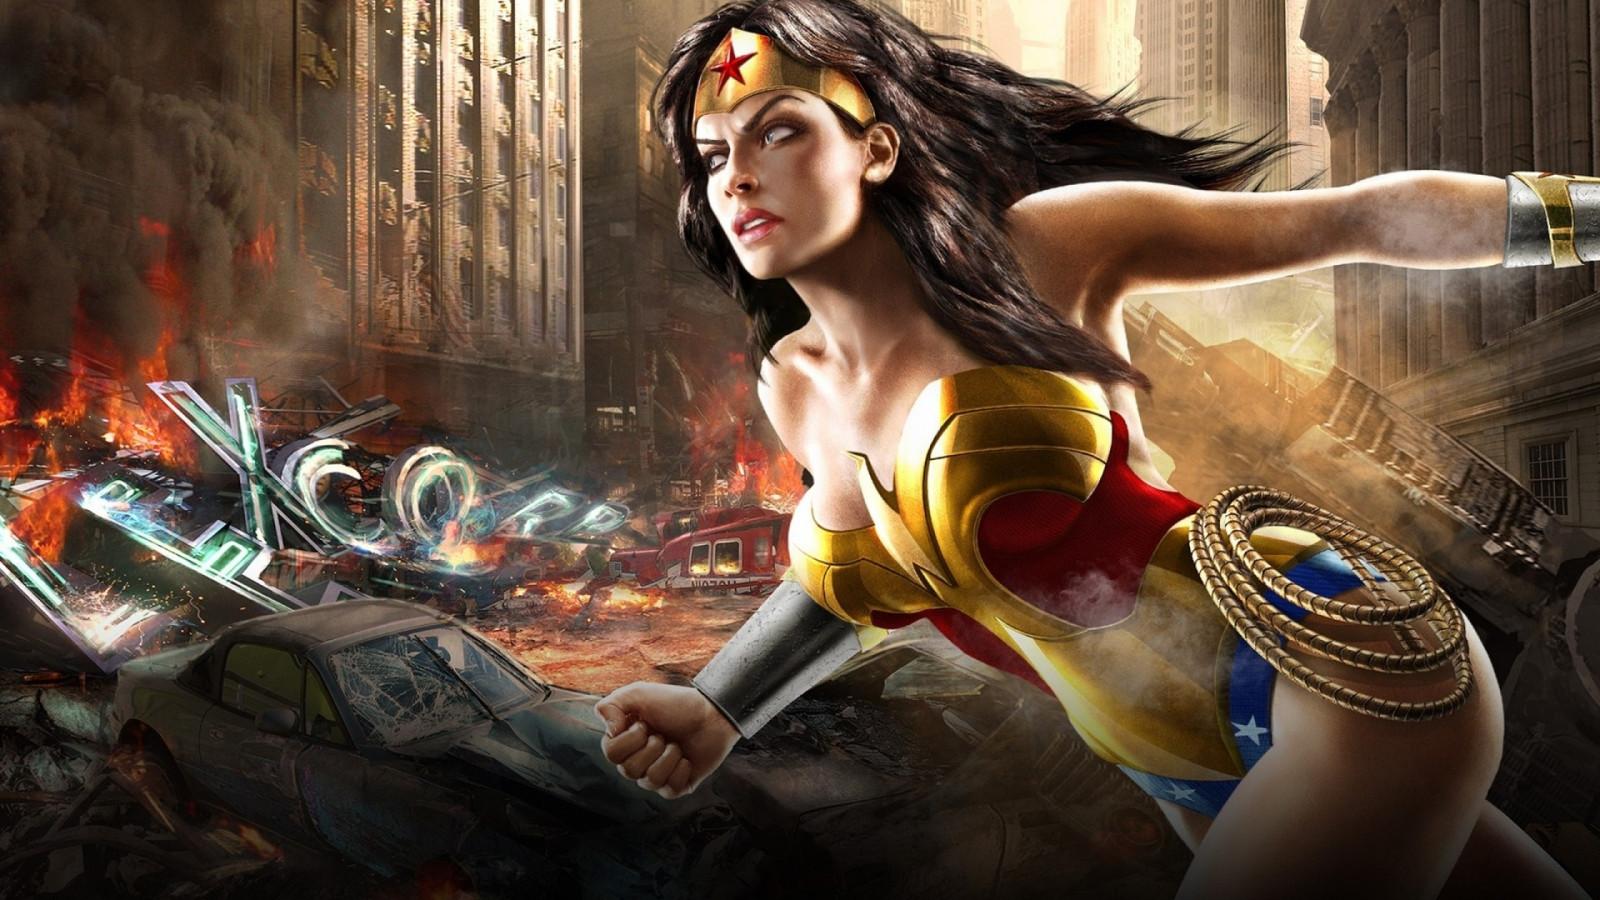 Wallpaper Video Games Anime Artwork Wonder Woman Dc Comics